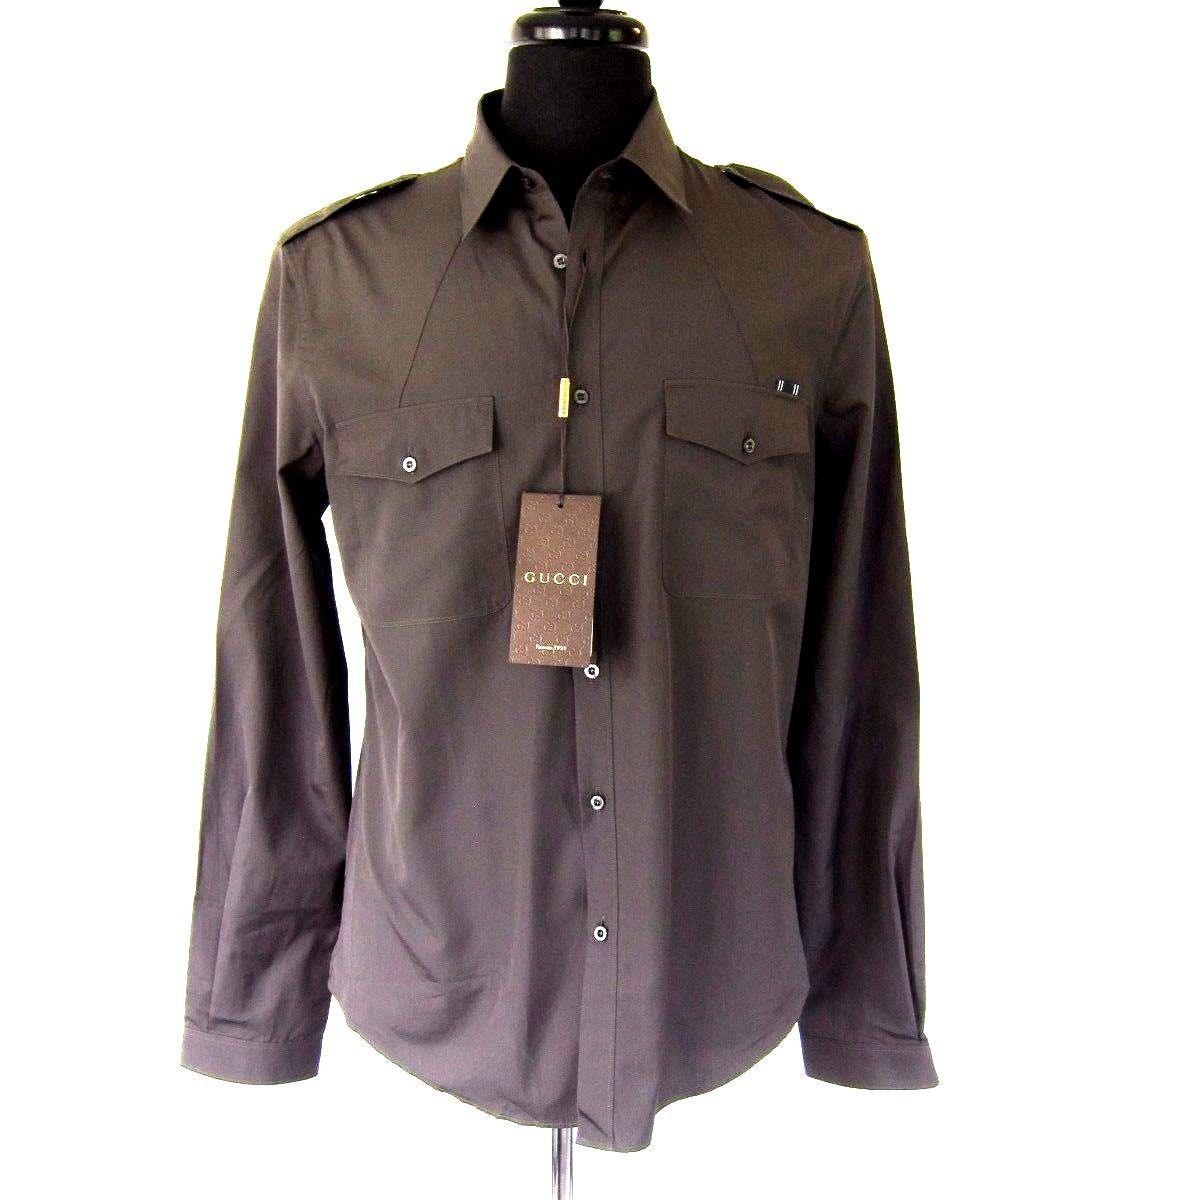 81c9e3e9f1a Gucci Dress Shirts Mens